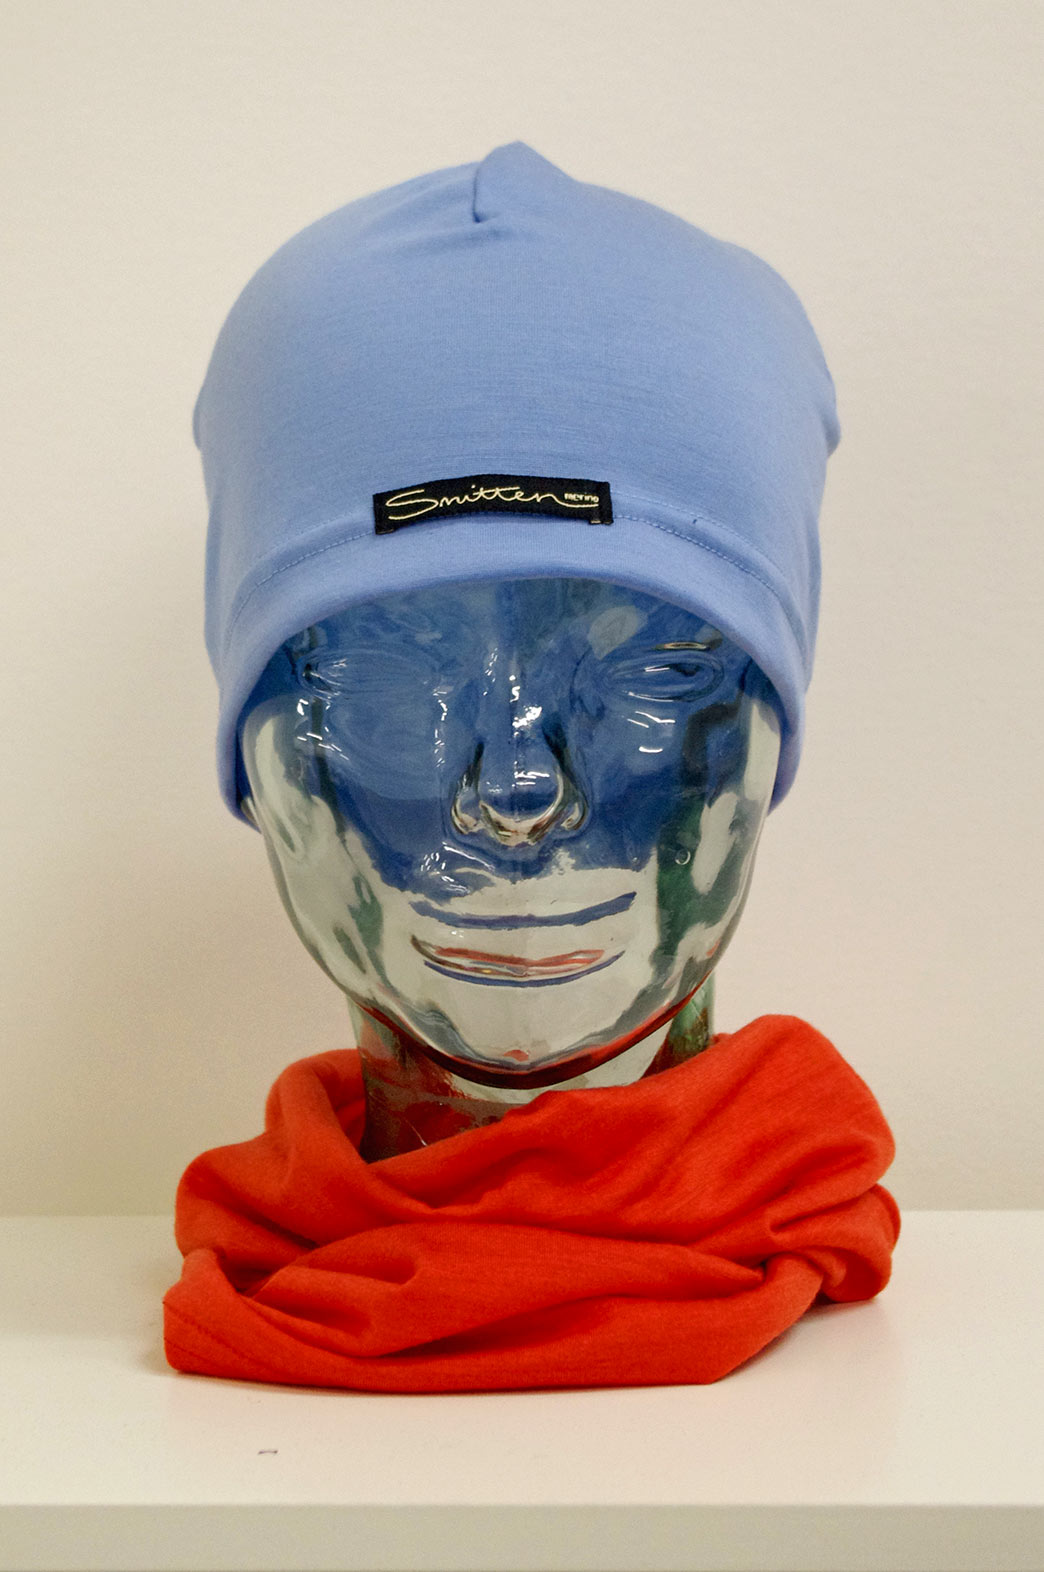 Beanie - Lightweight Skull Cap - Unisex Light Blue Lightweight Merino Wool Skull Cap Beanie - Smitten Merino Tasmania Australia